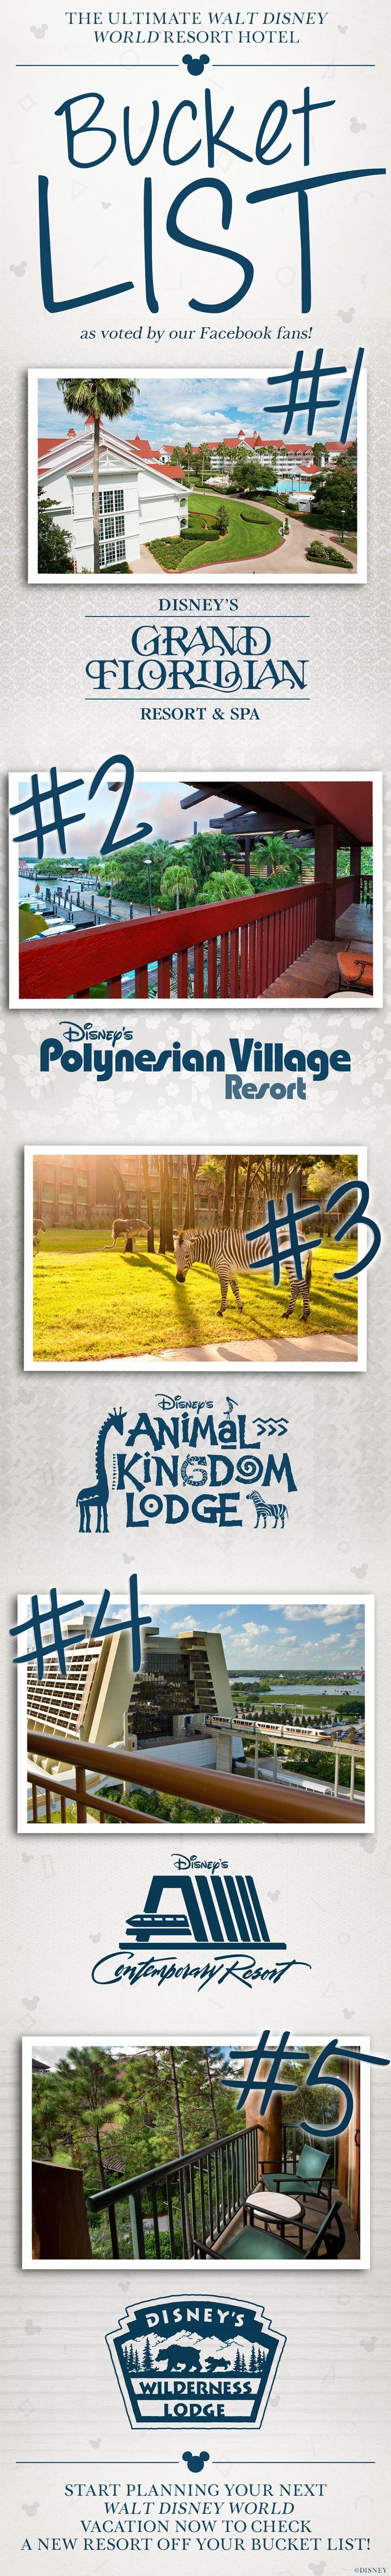 The ultimate Walt Disney World Resort hotel bucket list! #vacation #tips #tricks